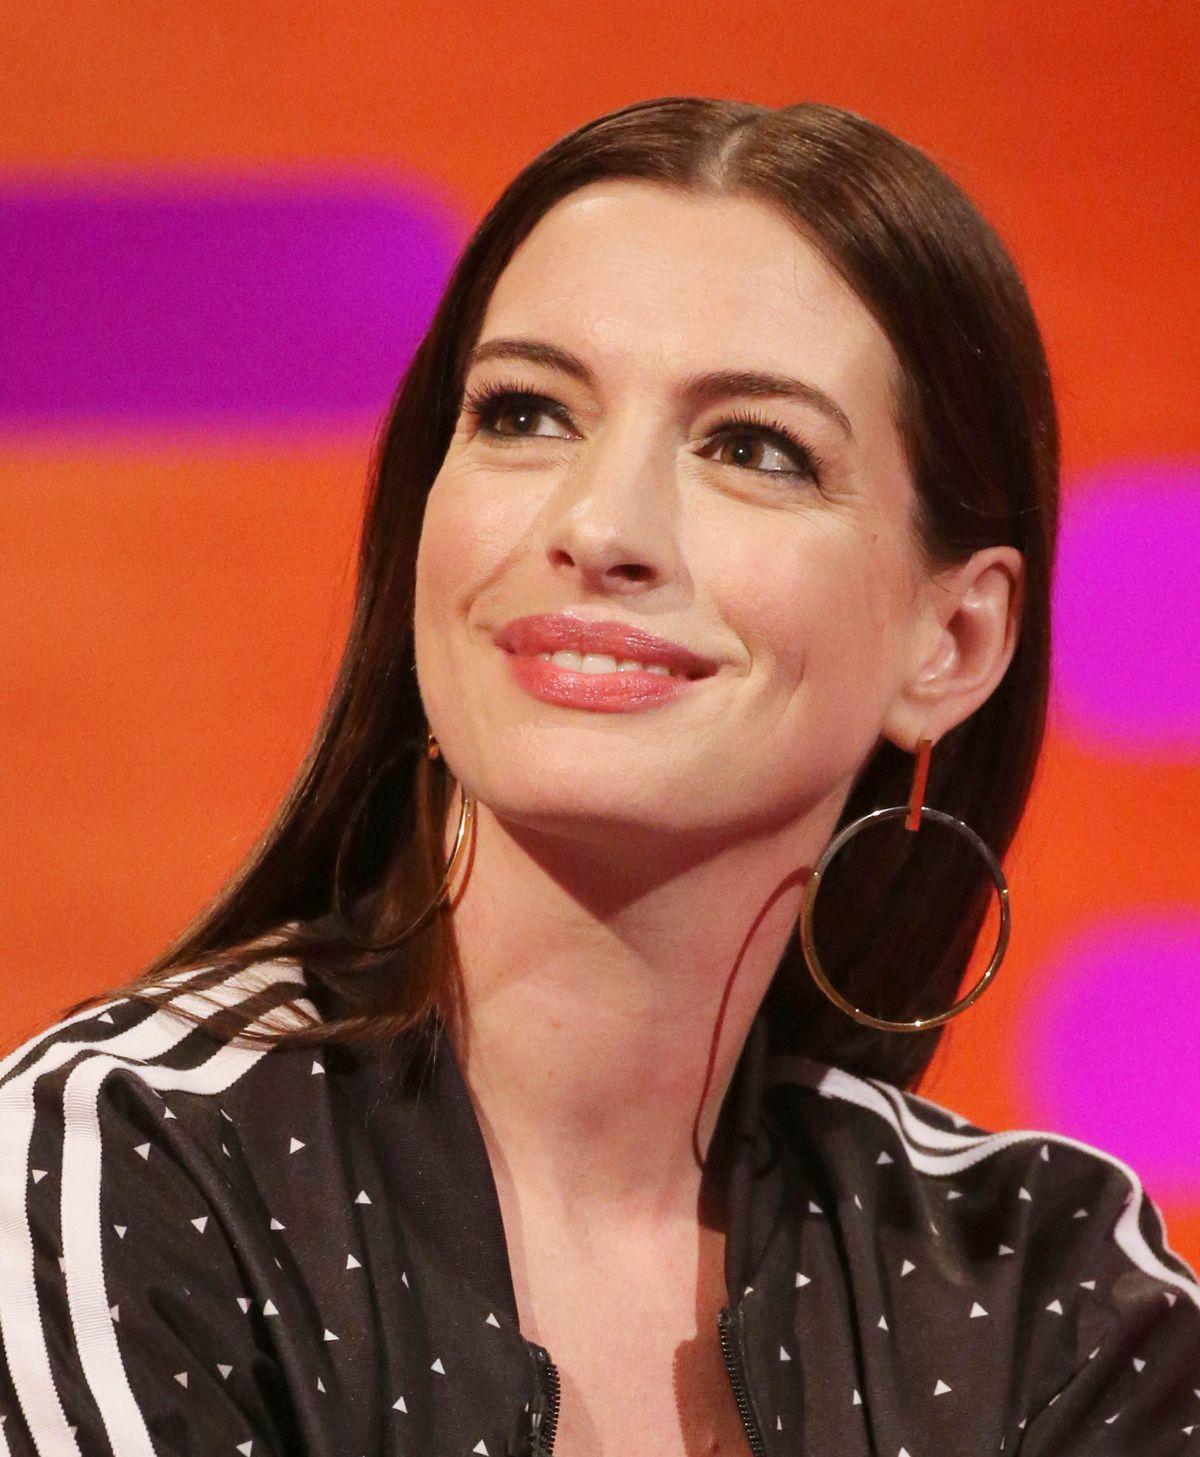 Anne Hathaway Hijo: ANNE HATHAWAY At Graham Norton Show 04/18/2019